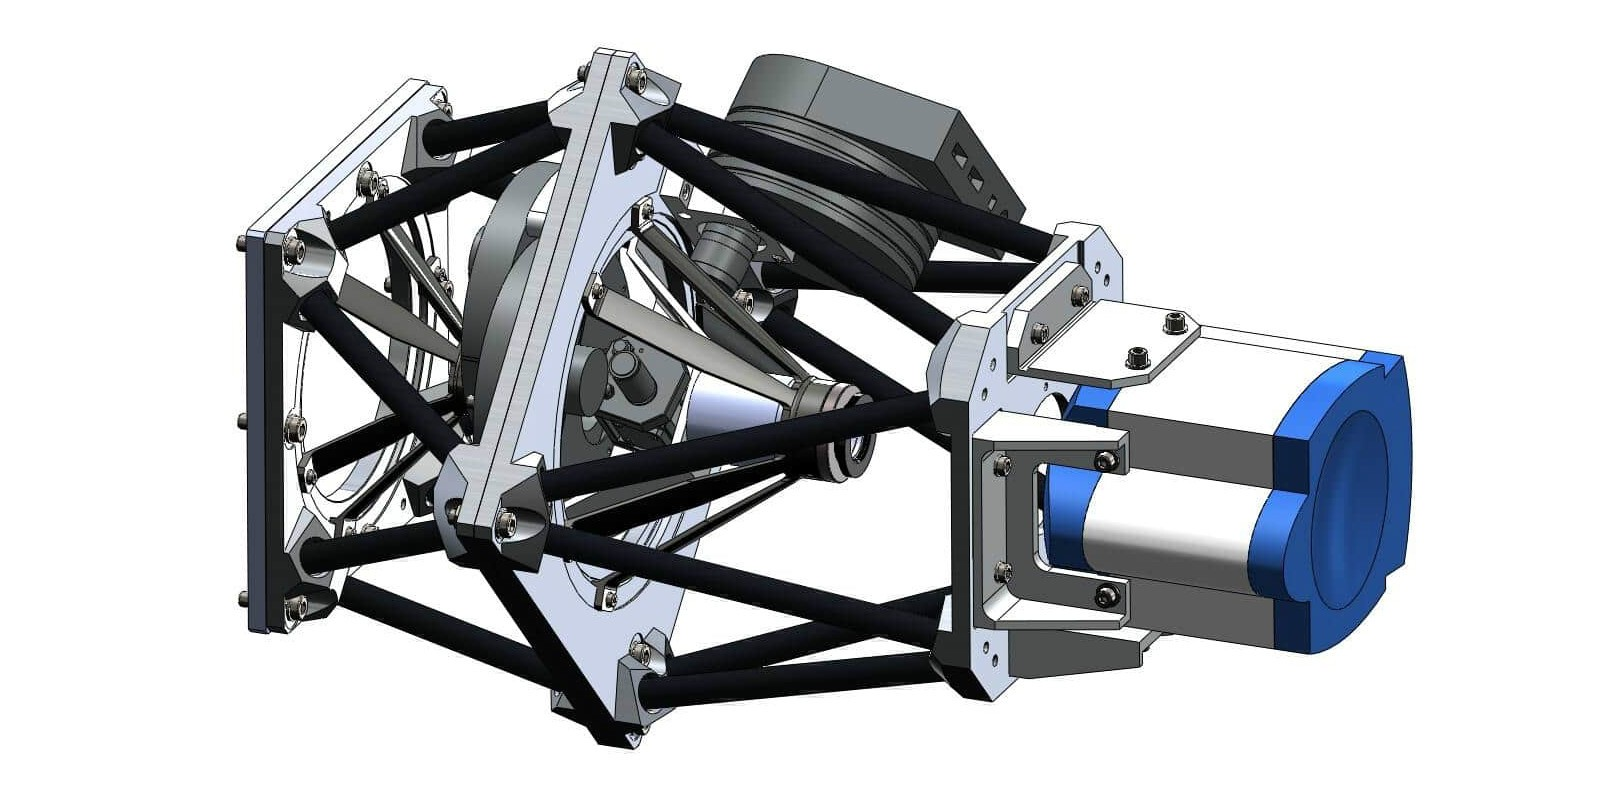 Fastcam_astronomy_instruments_Canary_Islands_IDOM_ADA_1_